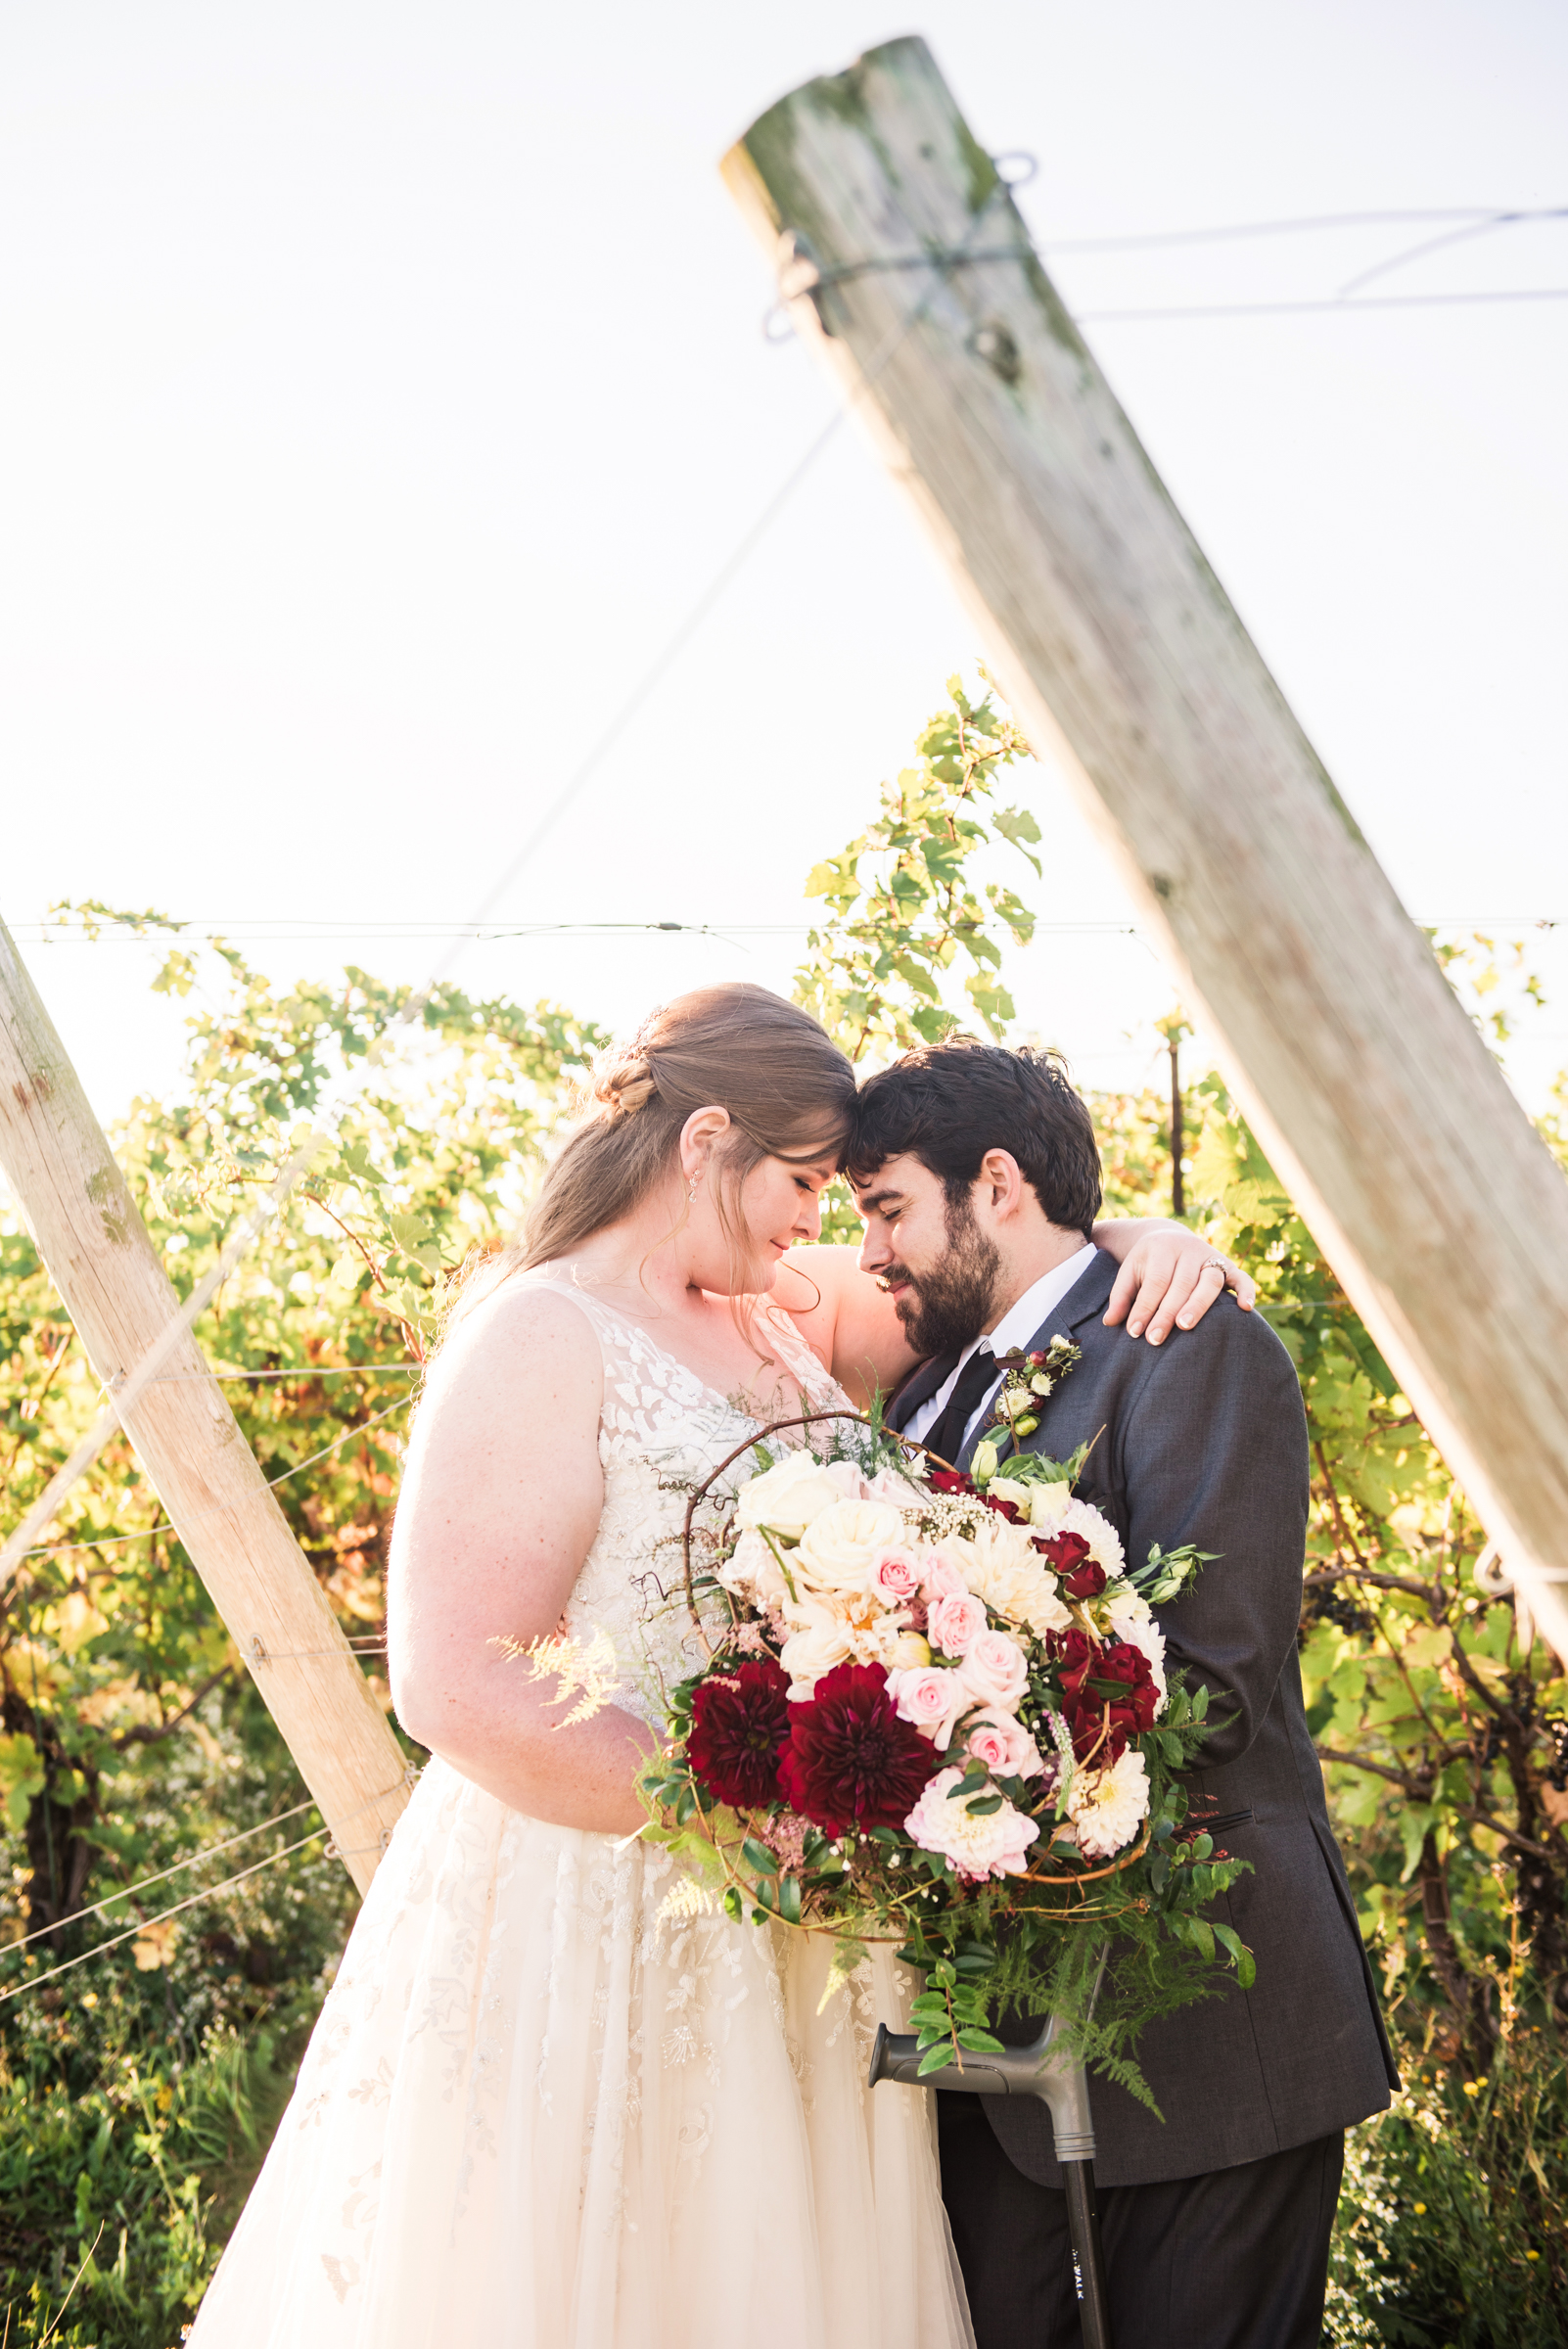 Zugibe_Vineyards_Finger_Lakes_Wedding_JILL_STUDIO_Rochester_NY_Photographer_DSC_4056.jpg